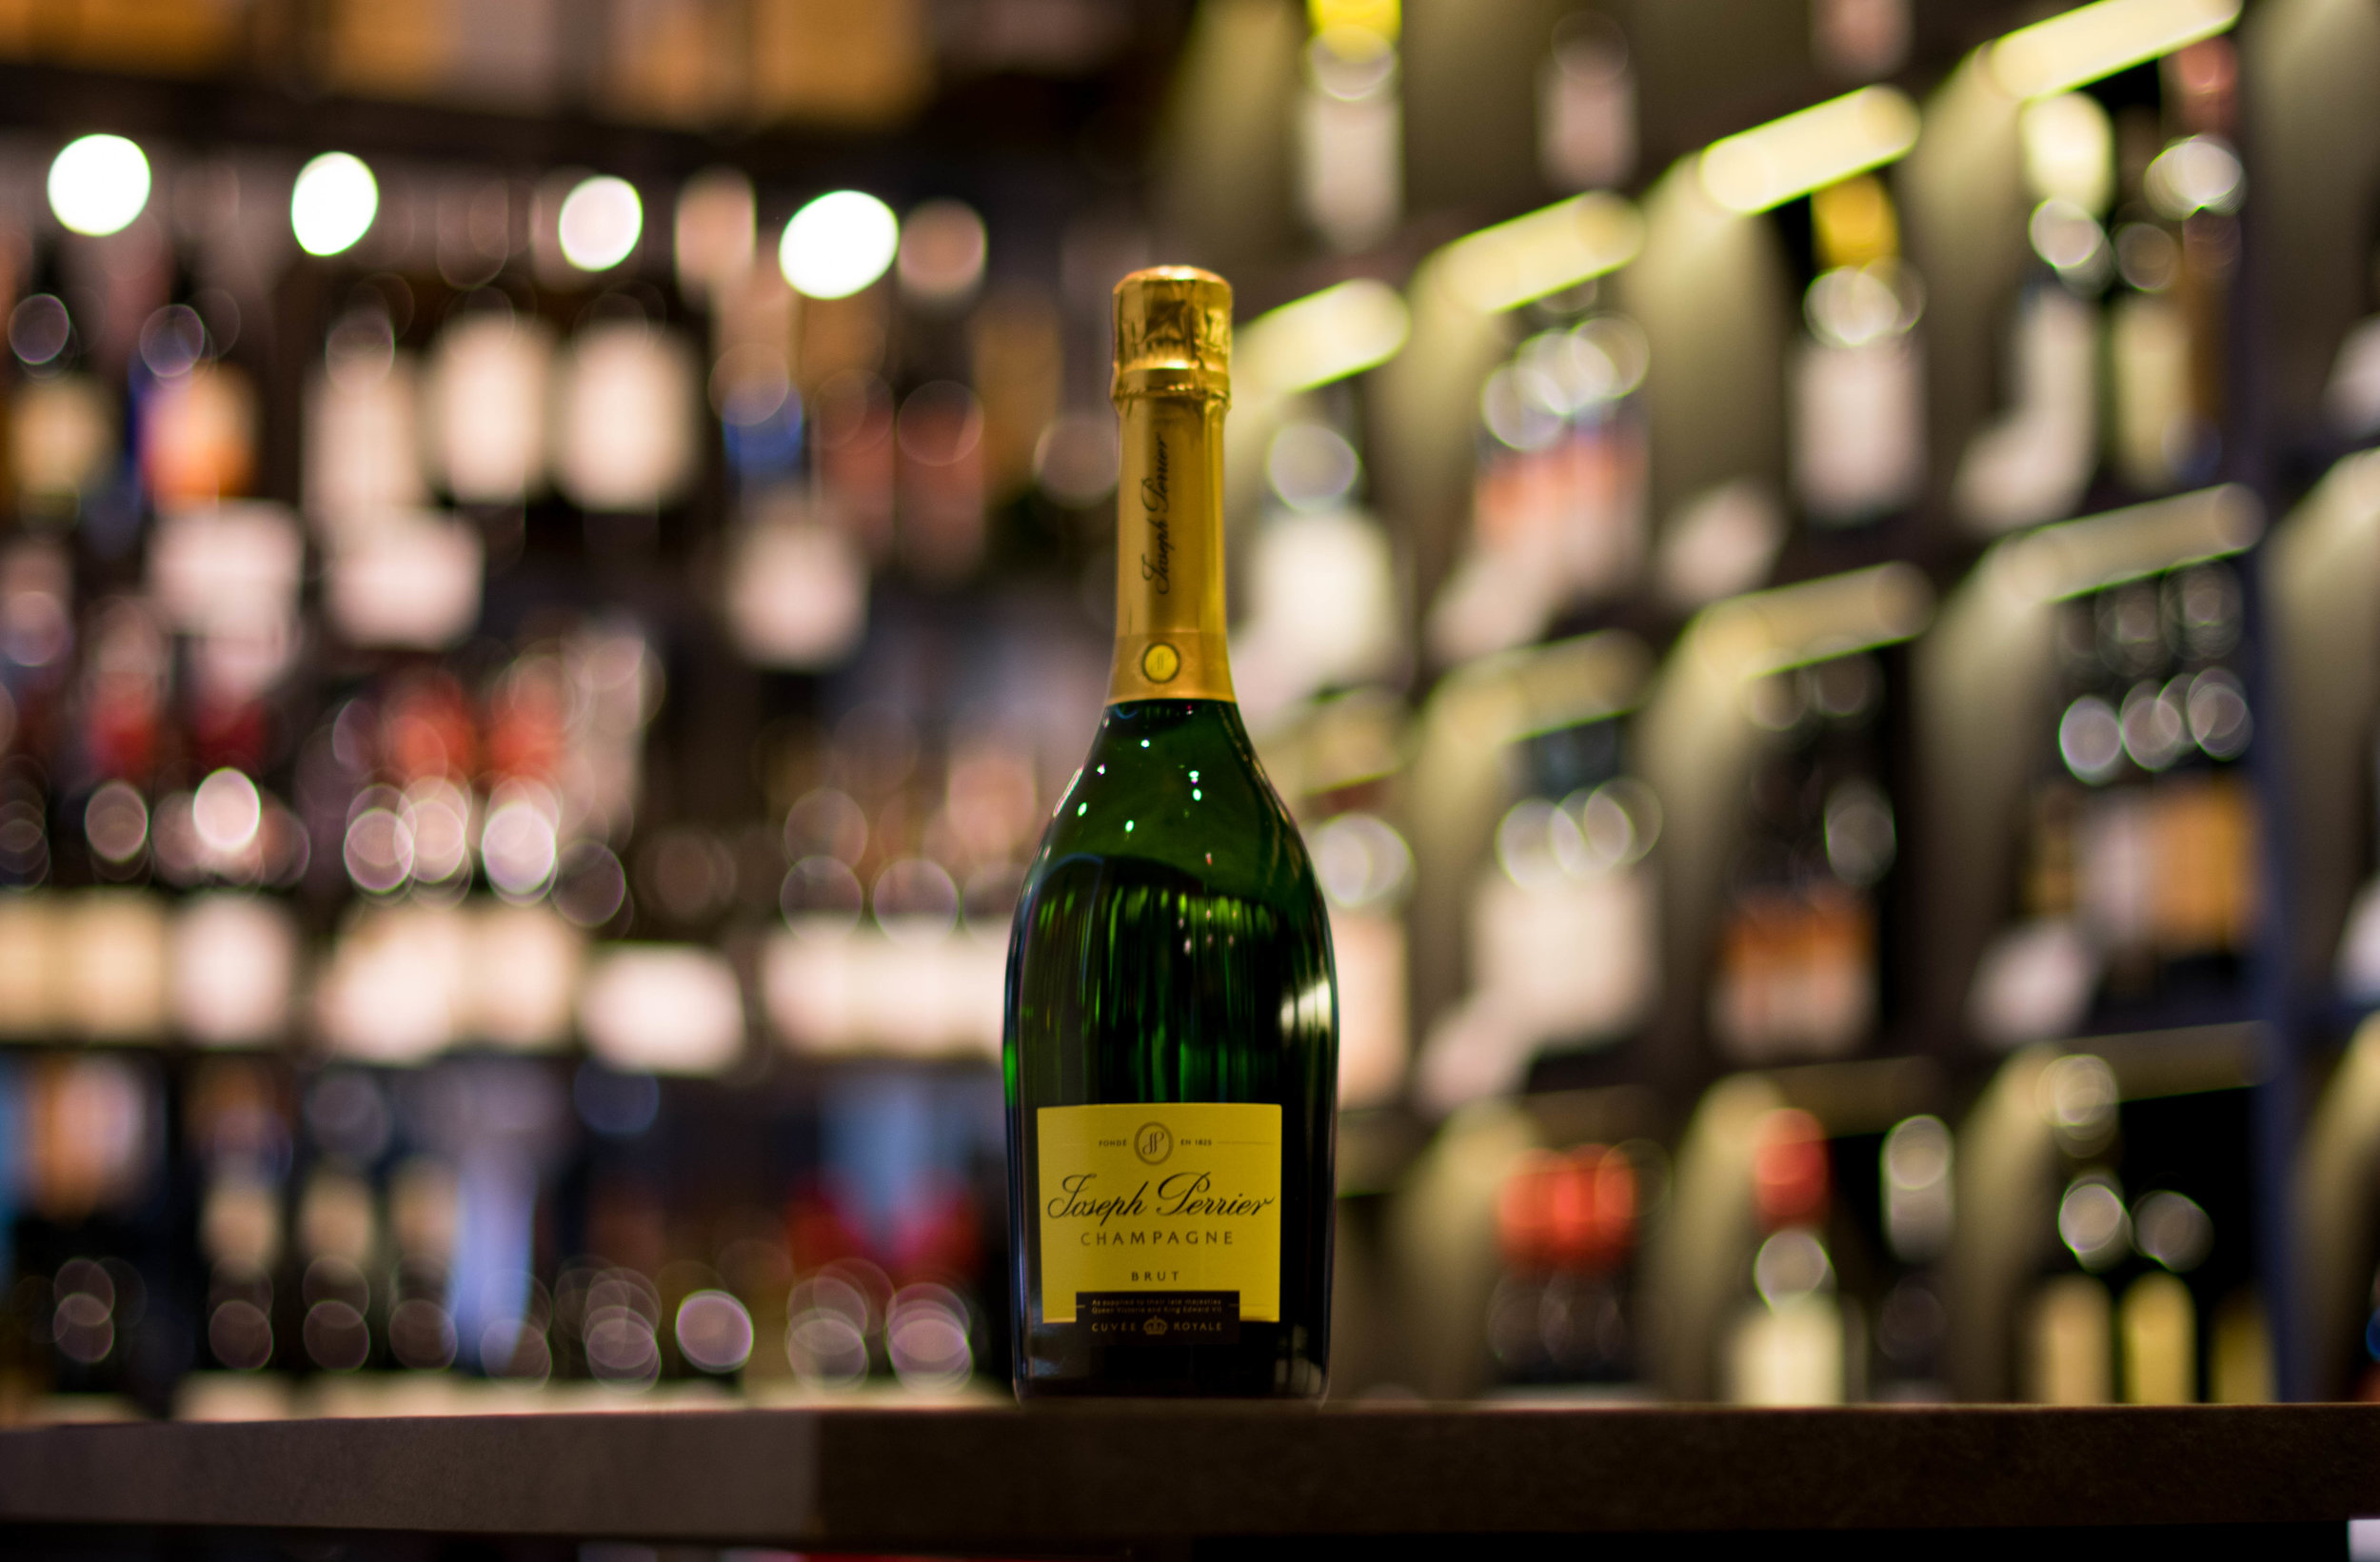 Joseph Perrier BRUT Champagne